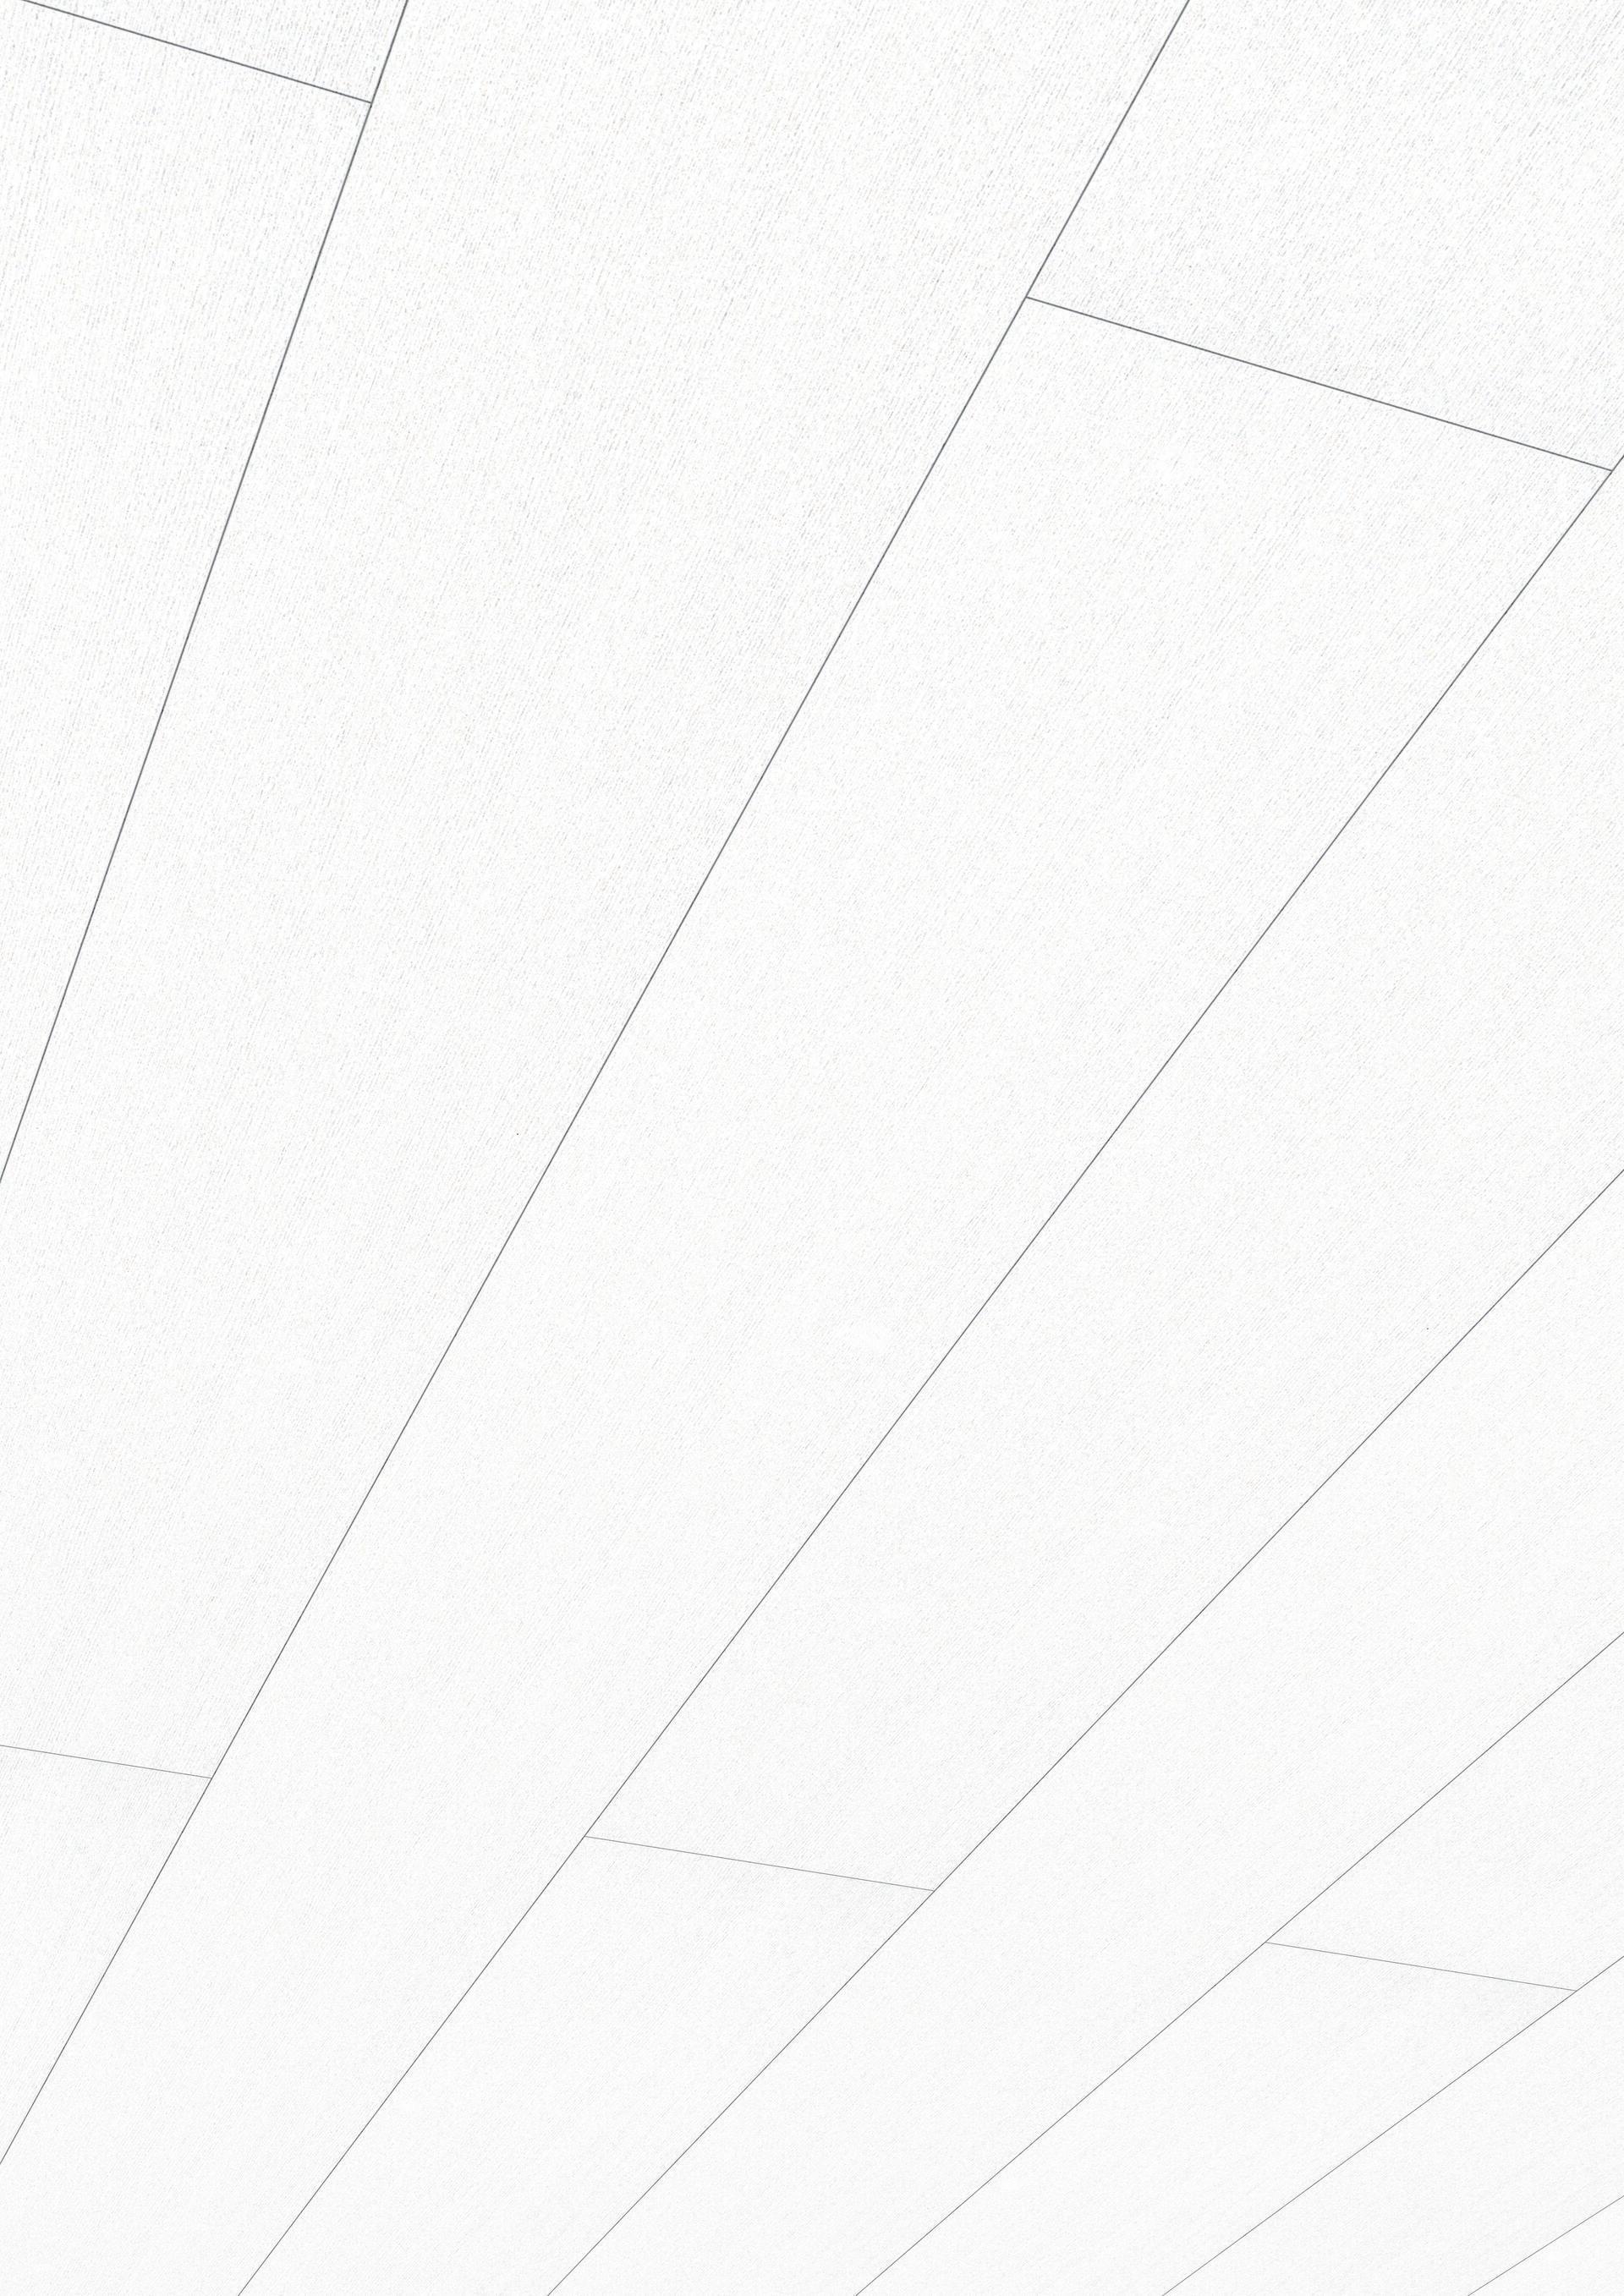 4017_Terra_DP250_Perspektive.jpg